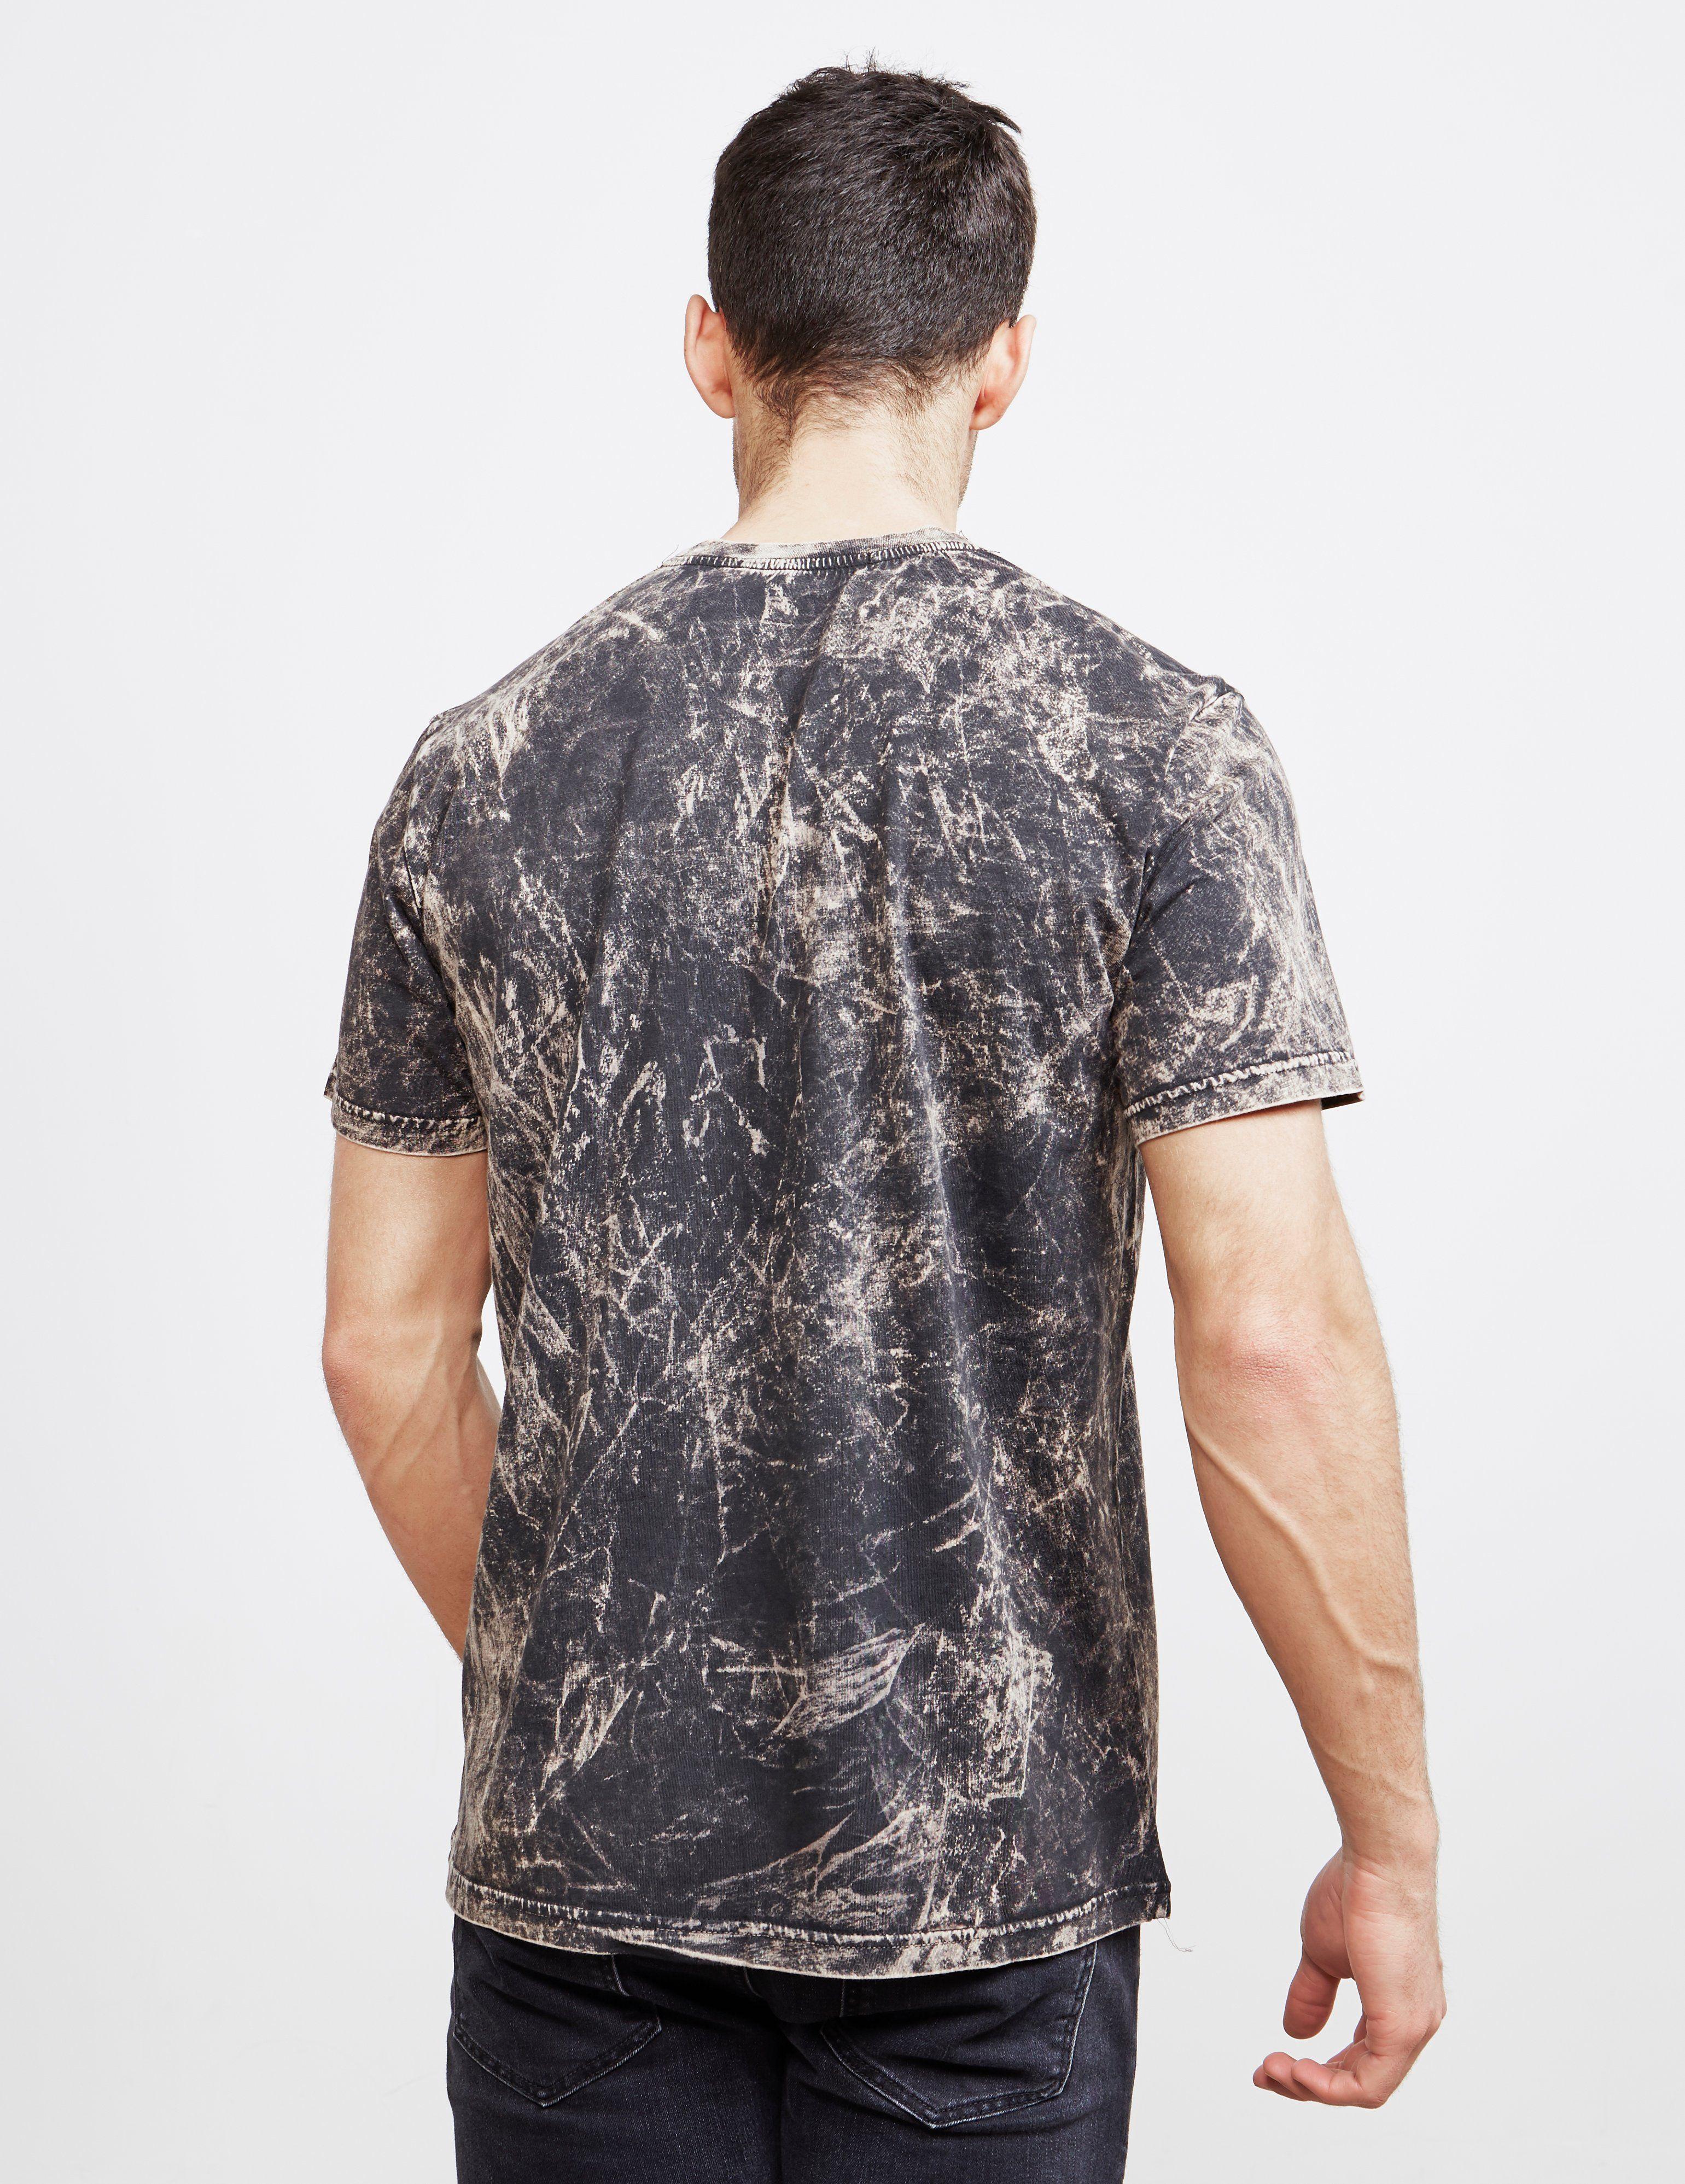 IUTER Dinosaur Short Sleeve T-Shirt